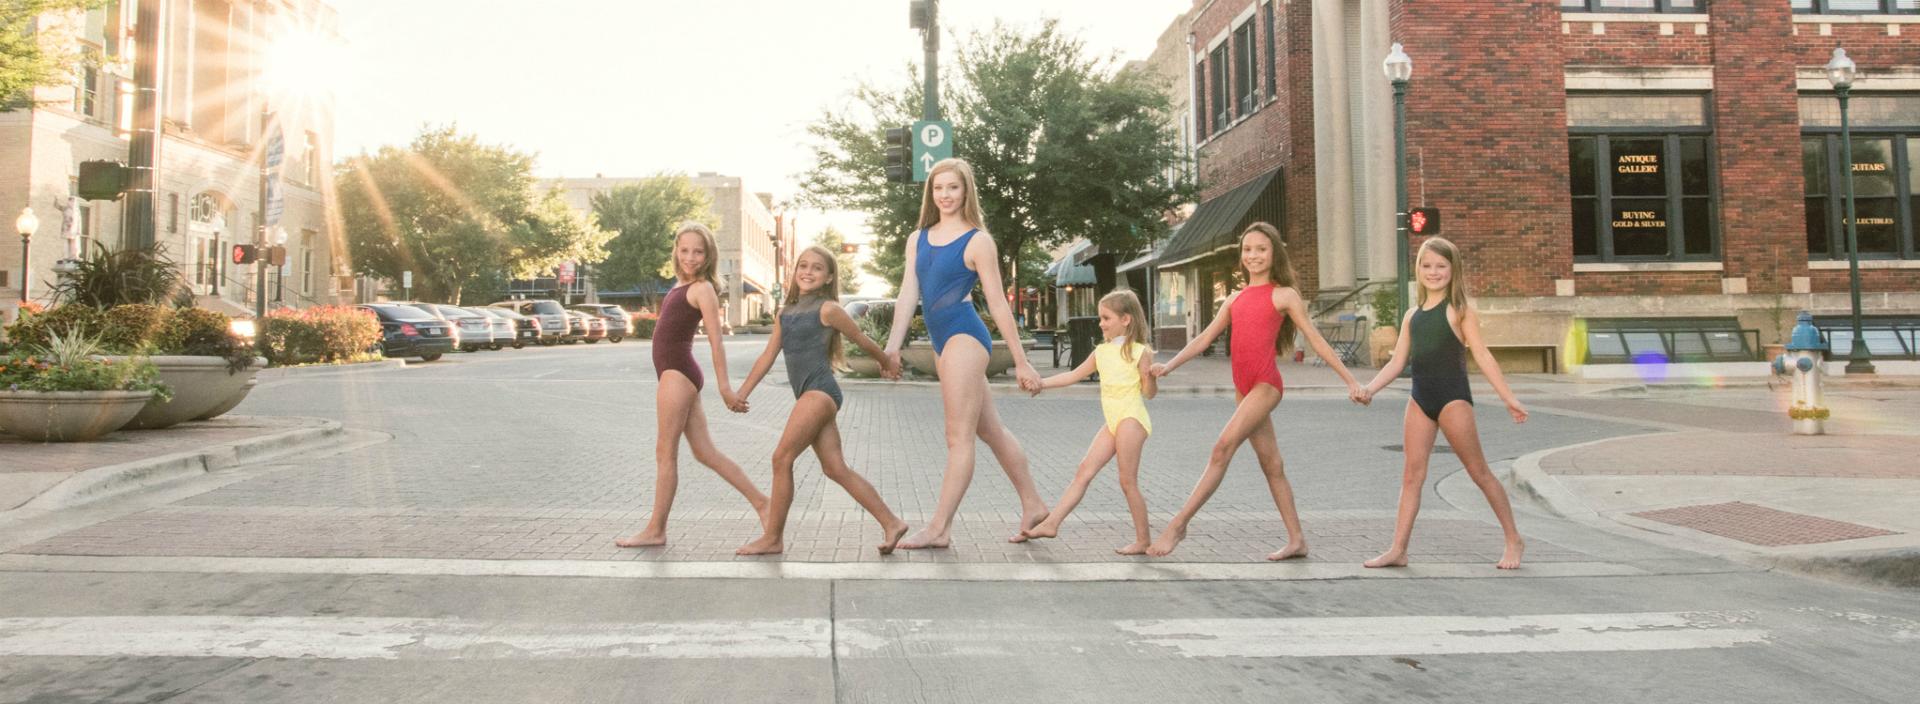 McKinney Dance Academy image 4